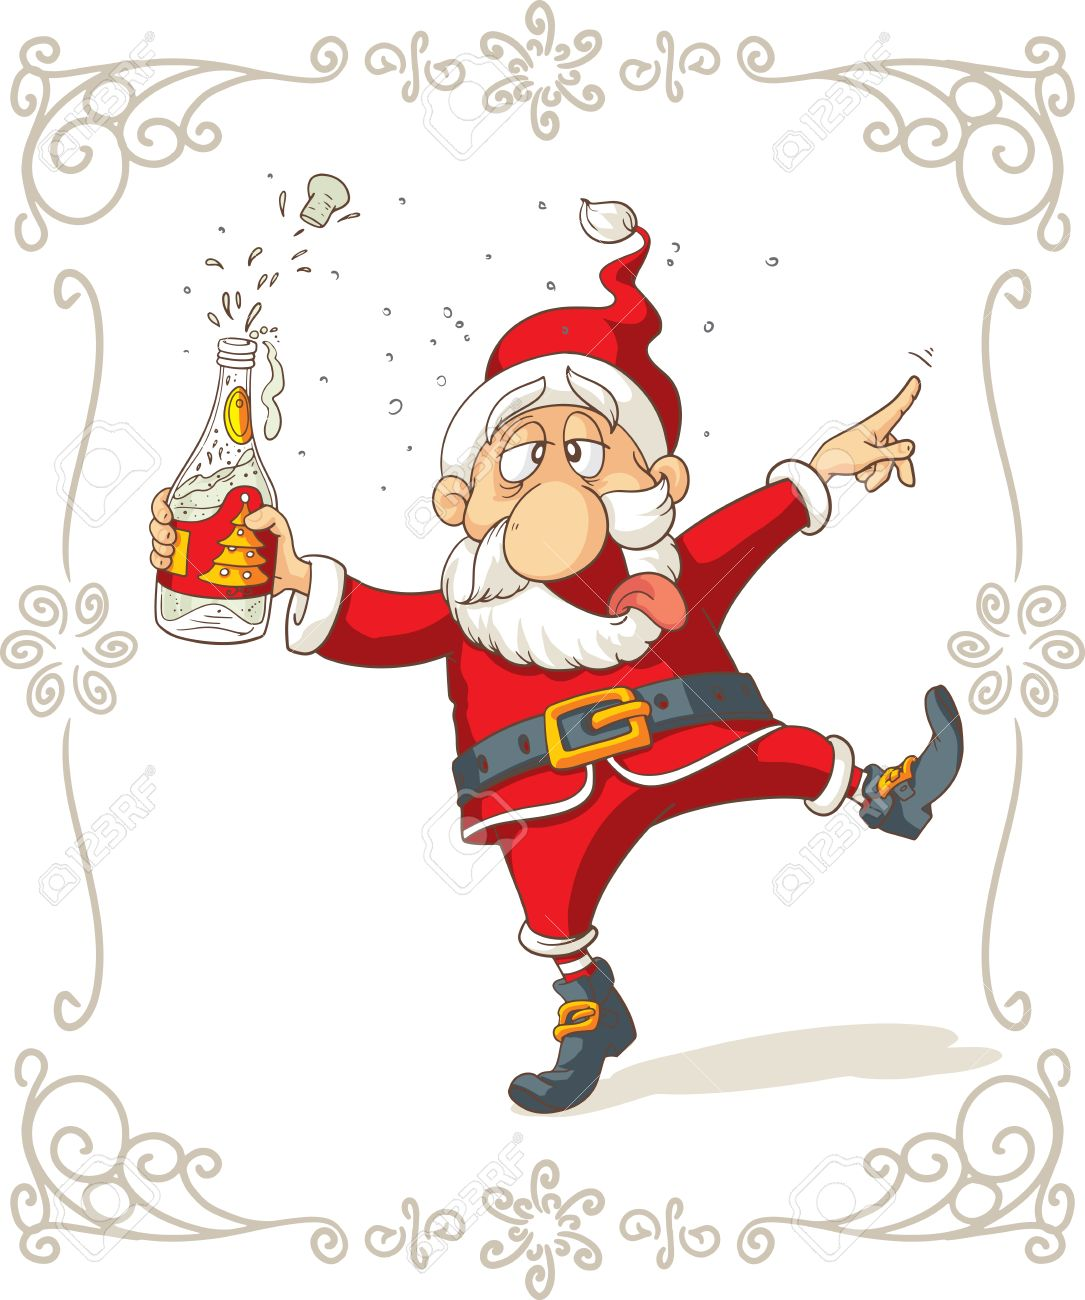 Drunk Santa Dancing Cartoon - 46917893